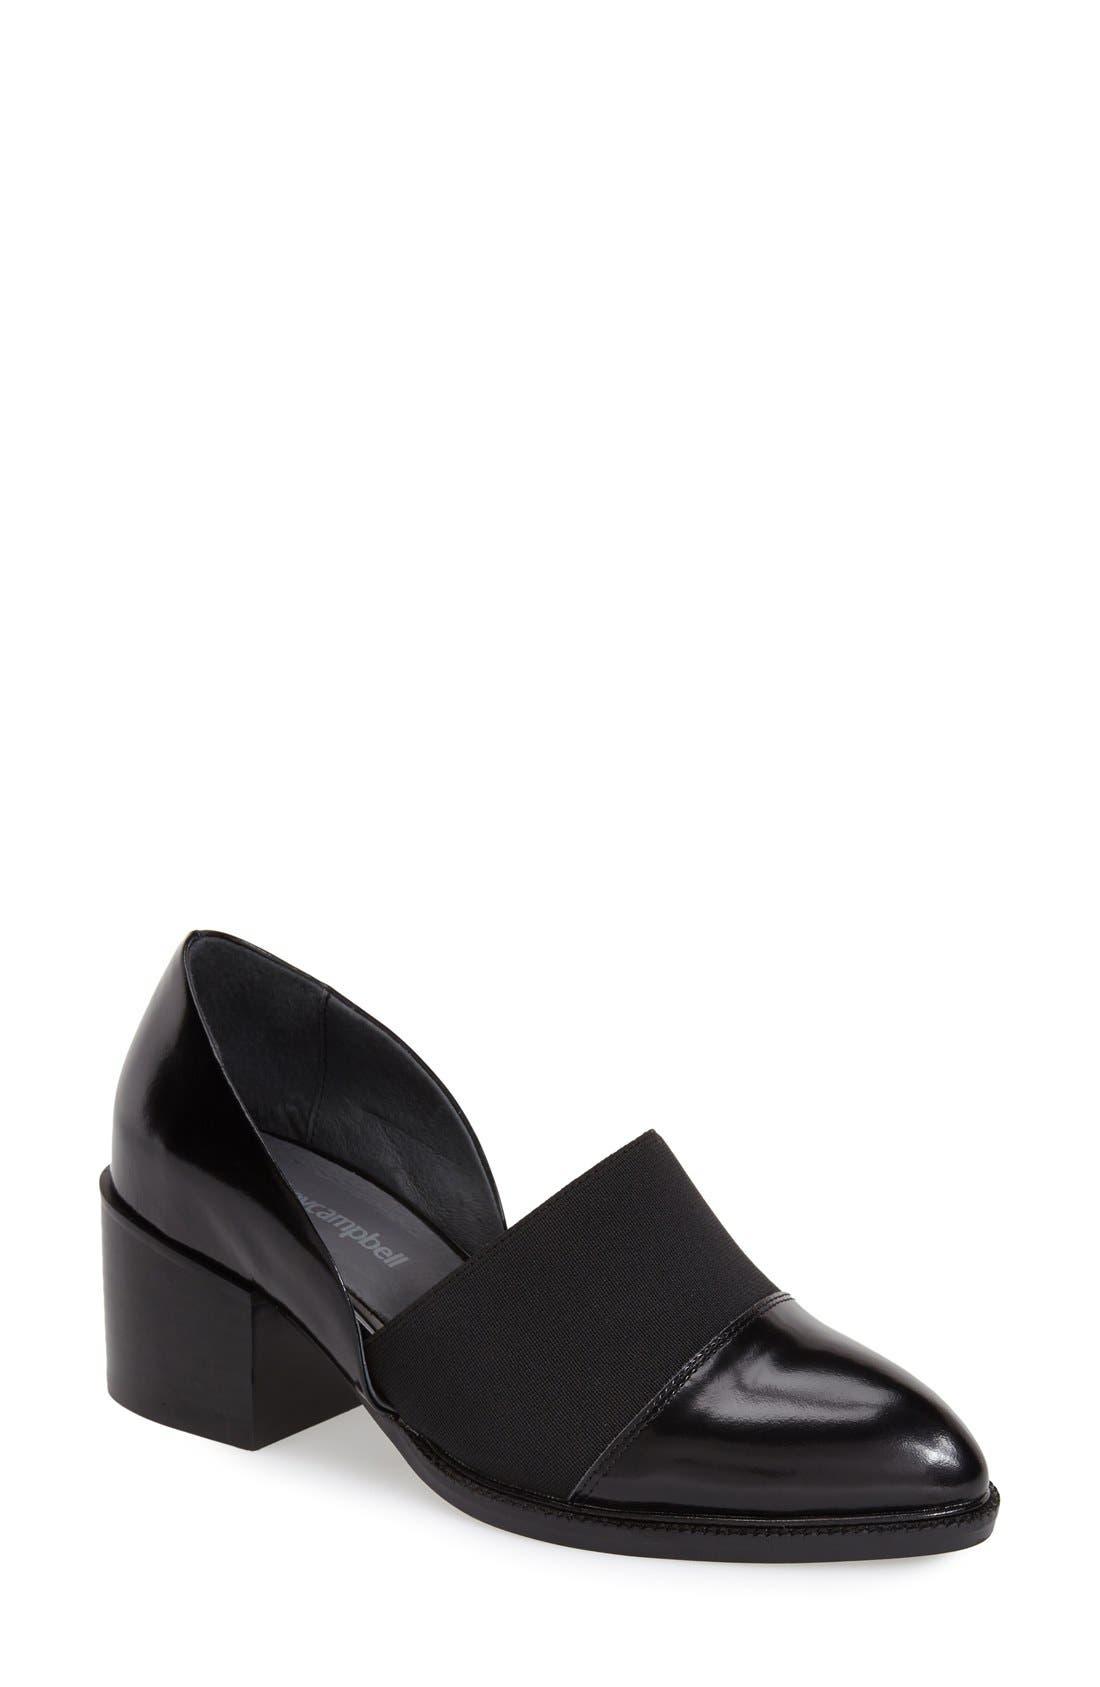 Main Image - Jeffrey Campbell 'Shriver' Almond Toe Loafer (Women)